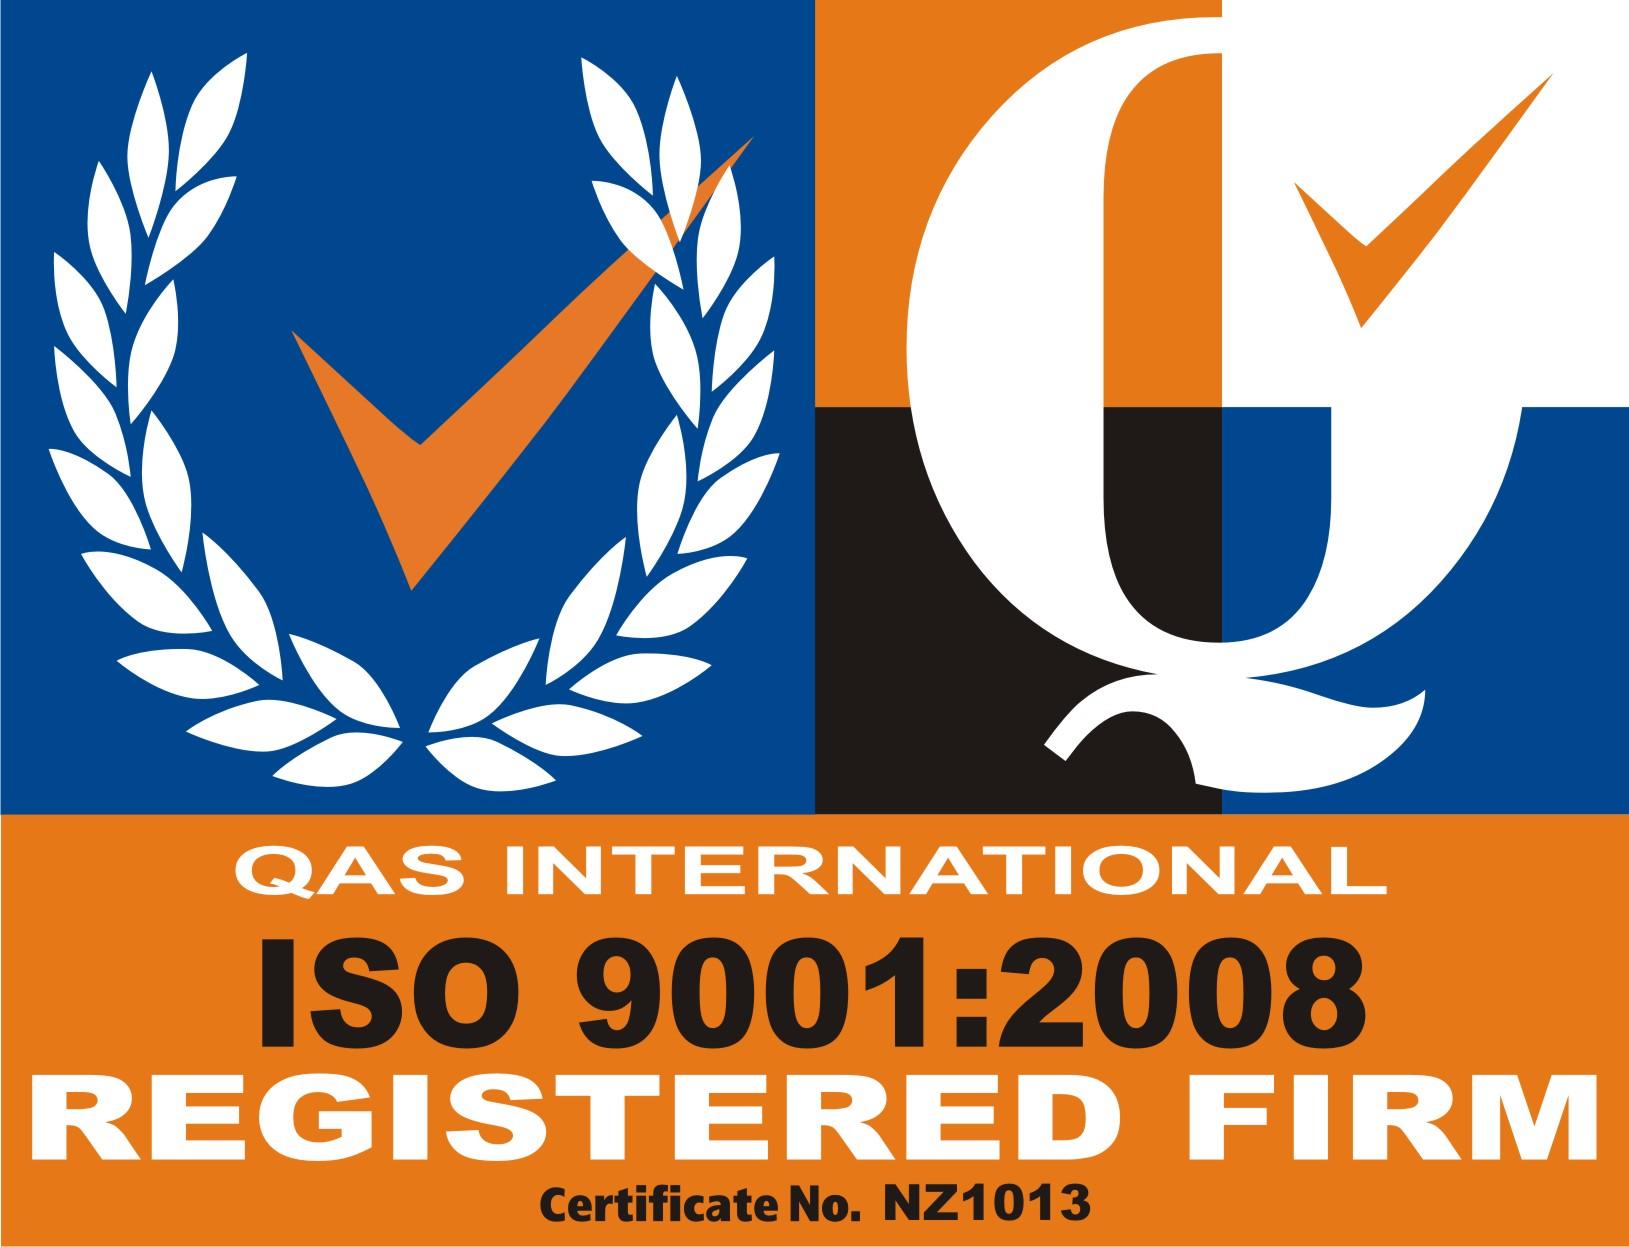 180201 New QAS LOGO Template.jpg